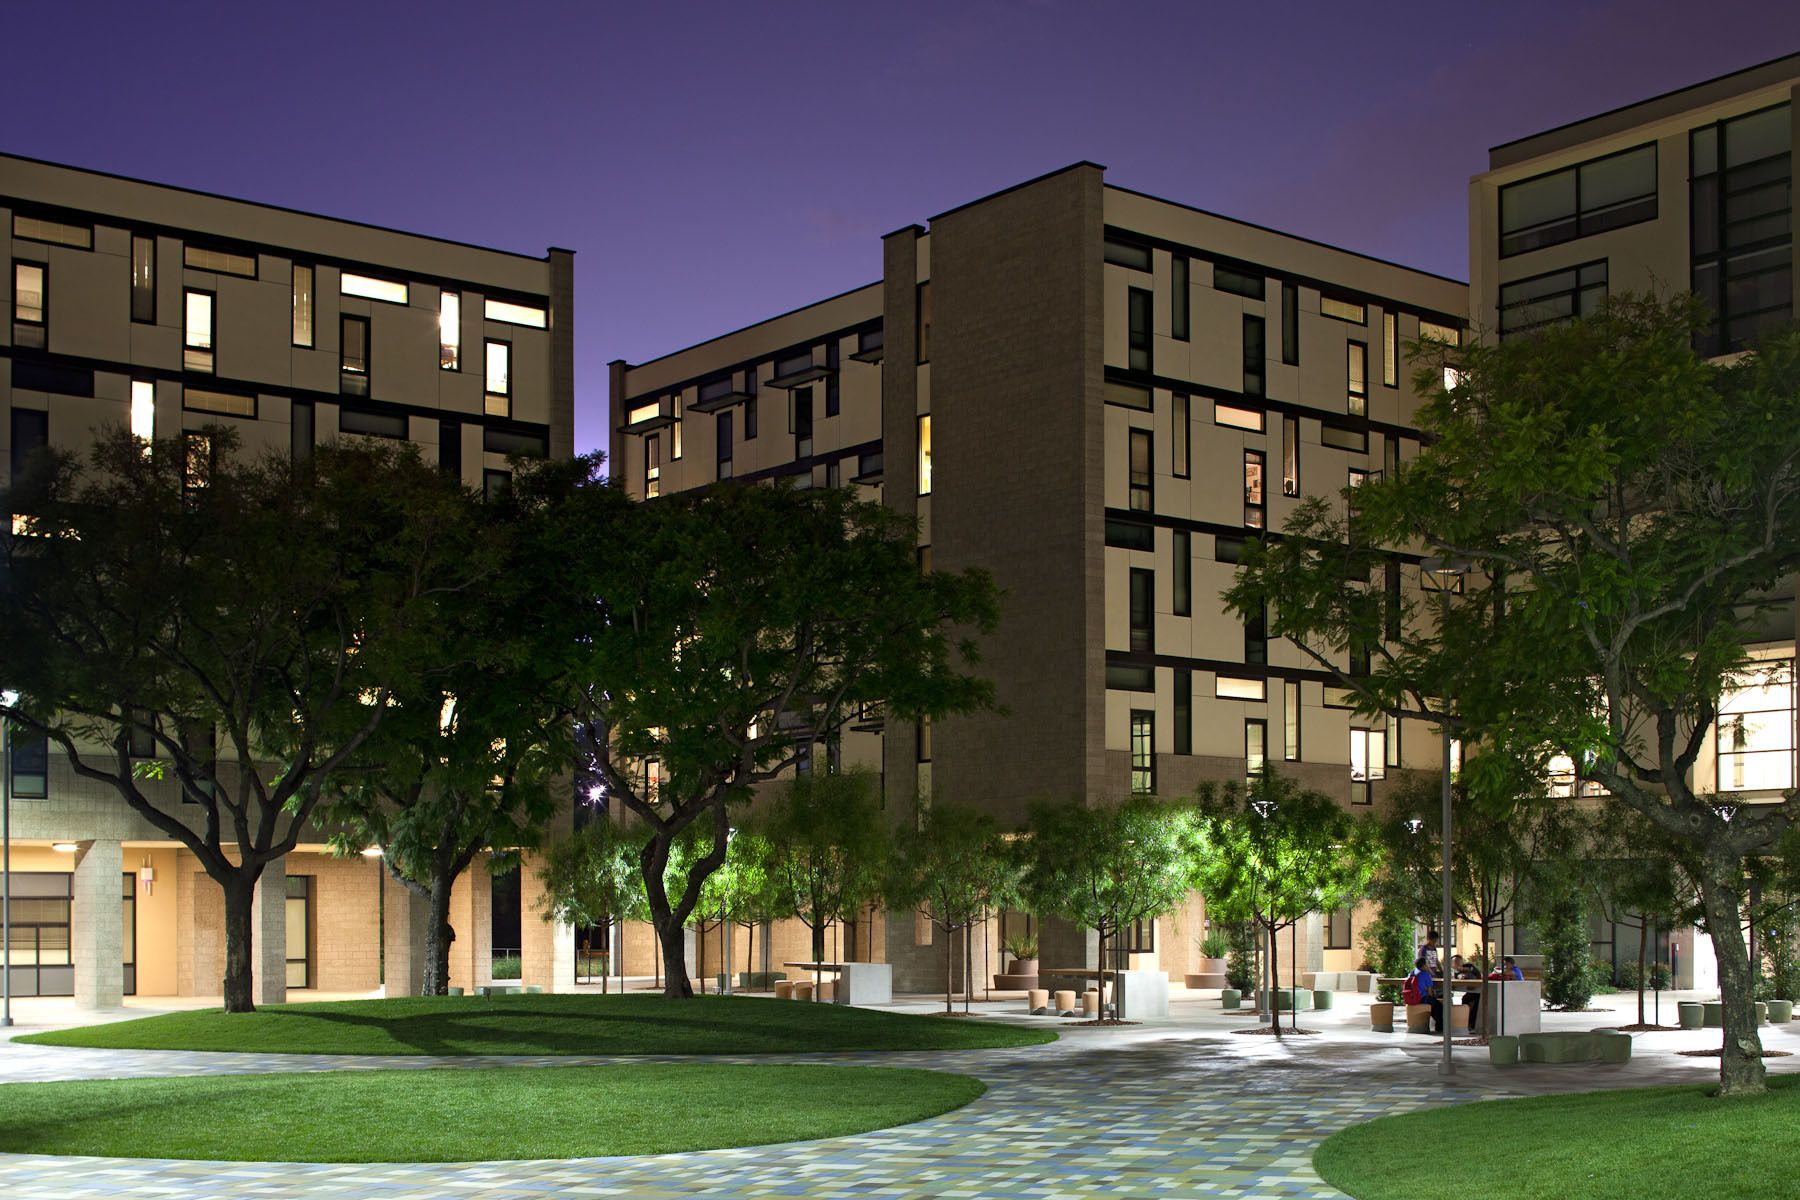 CSU Fullerton Student Housing